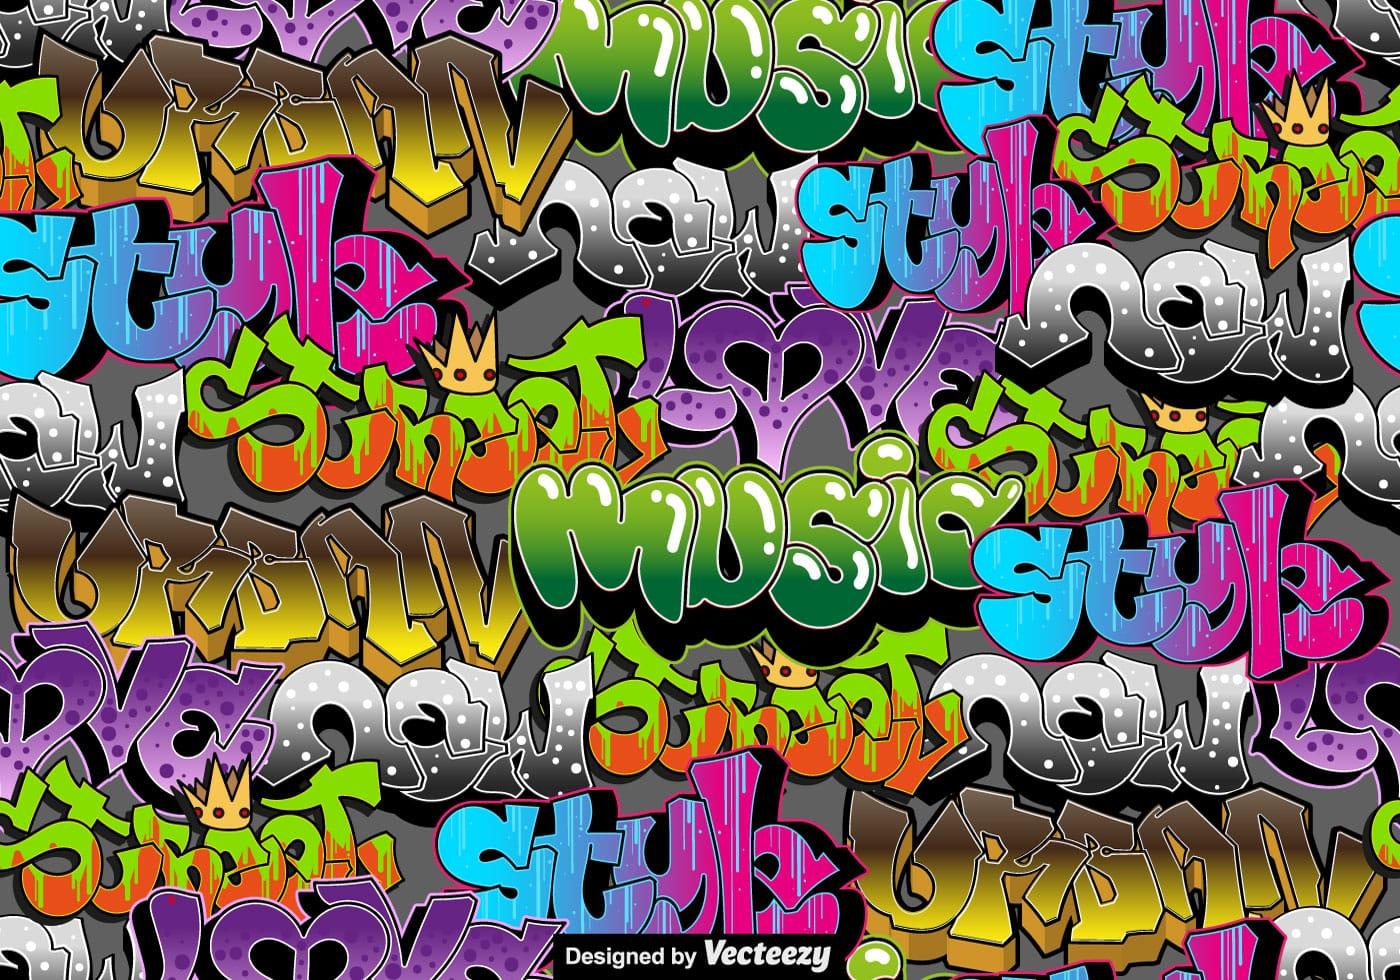 Graffiti free vector art 9873 free downloads